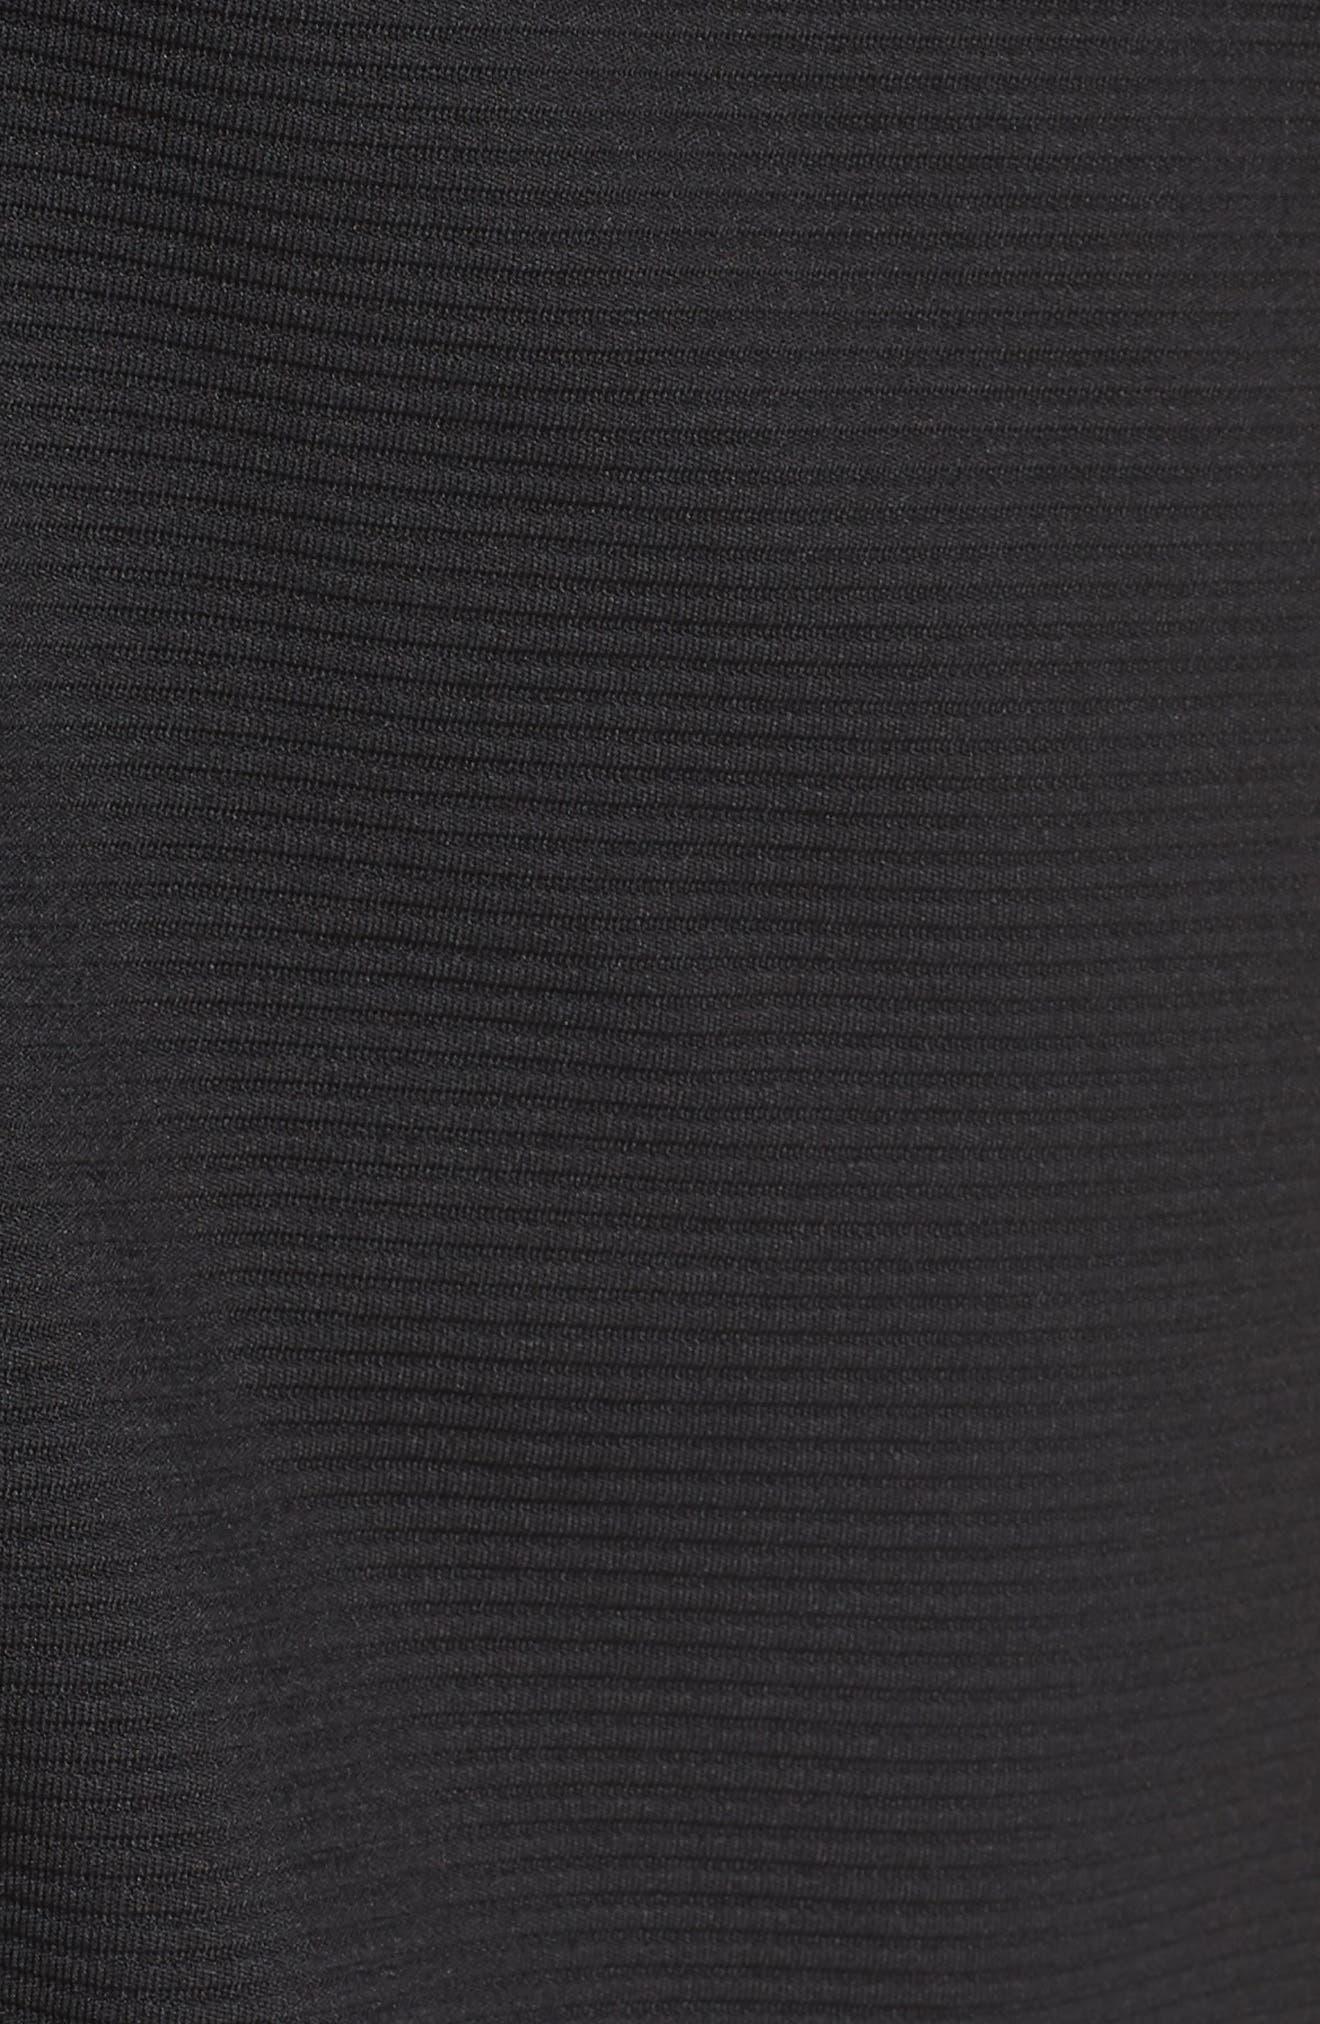 The Lacquer Bonded Jersey Kimono,                             Alternate thumbnail 6, color,                             001